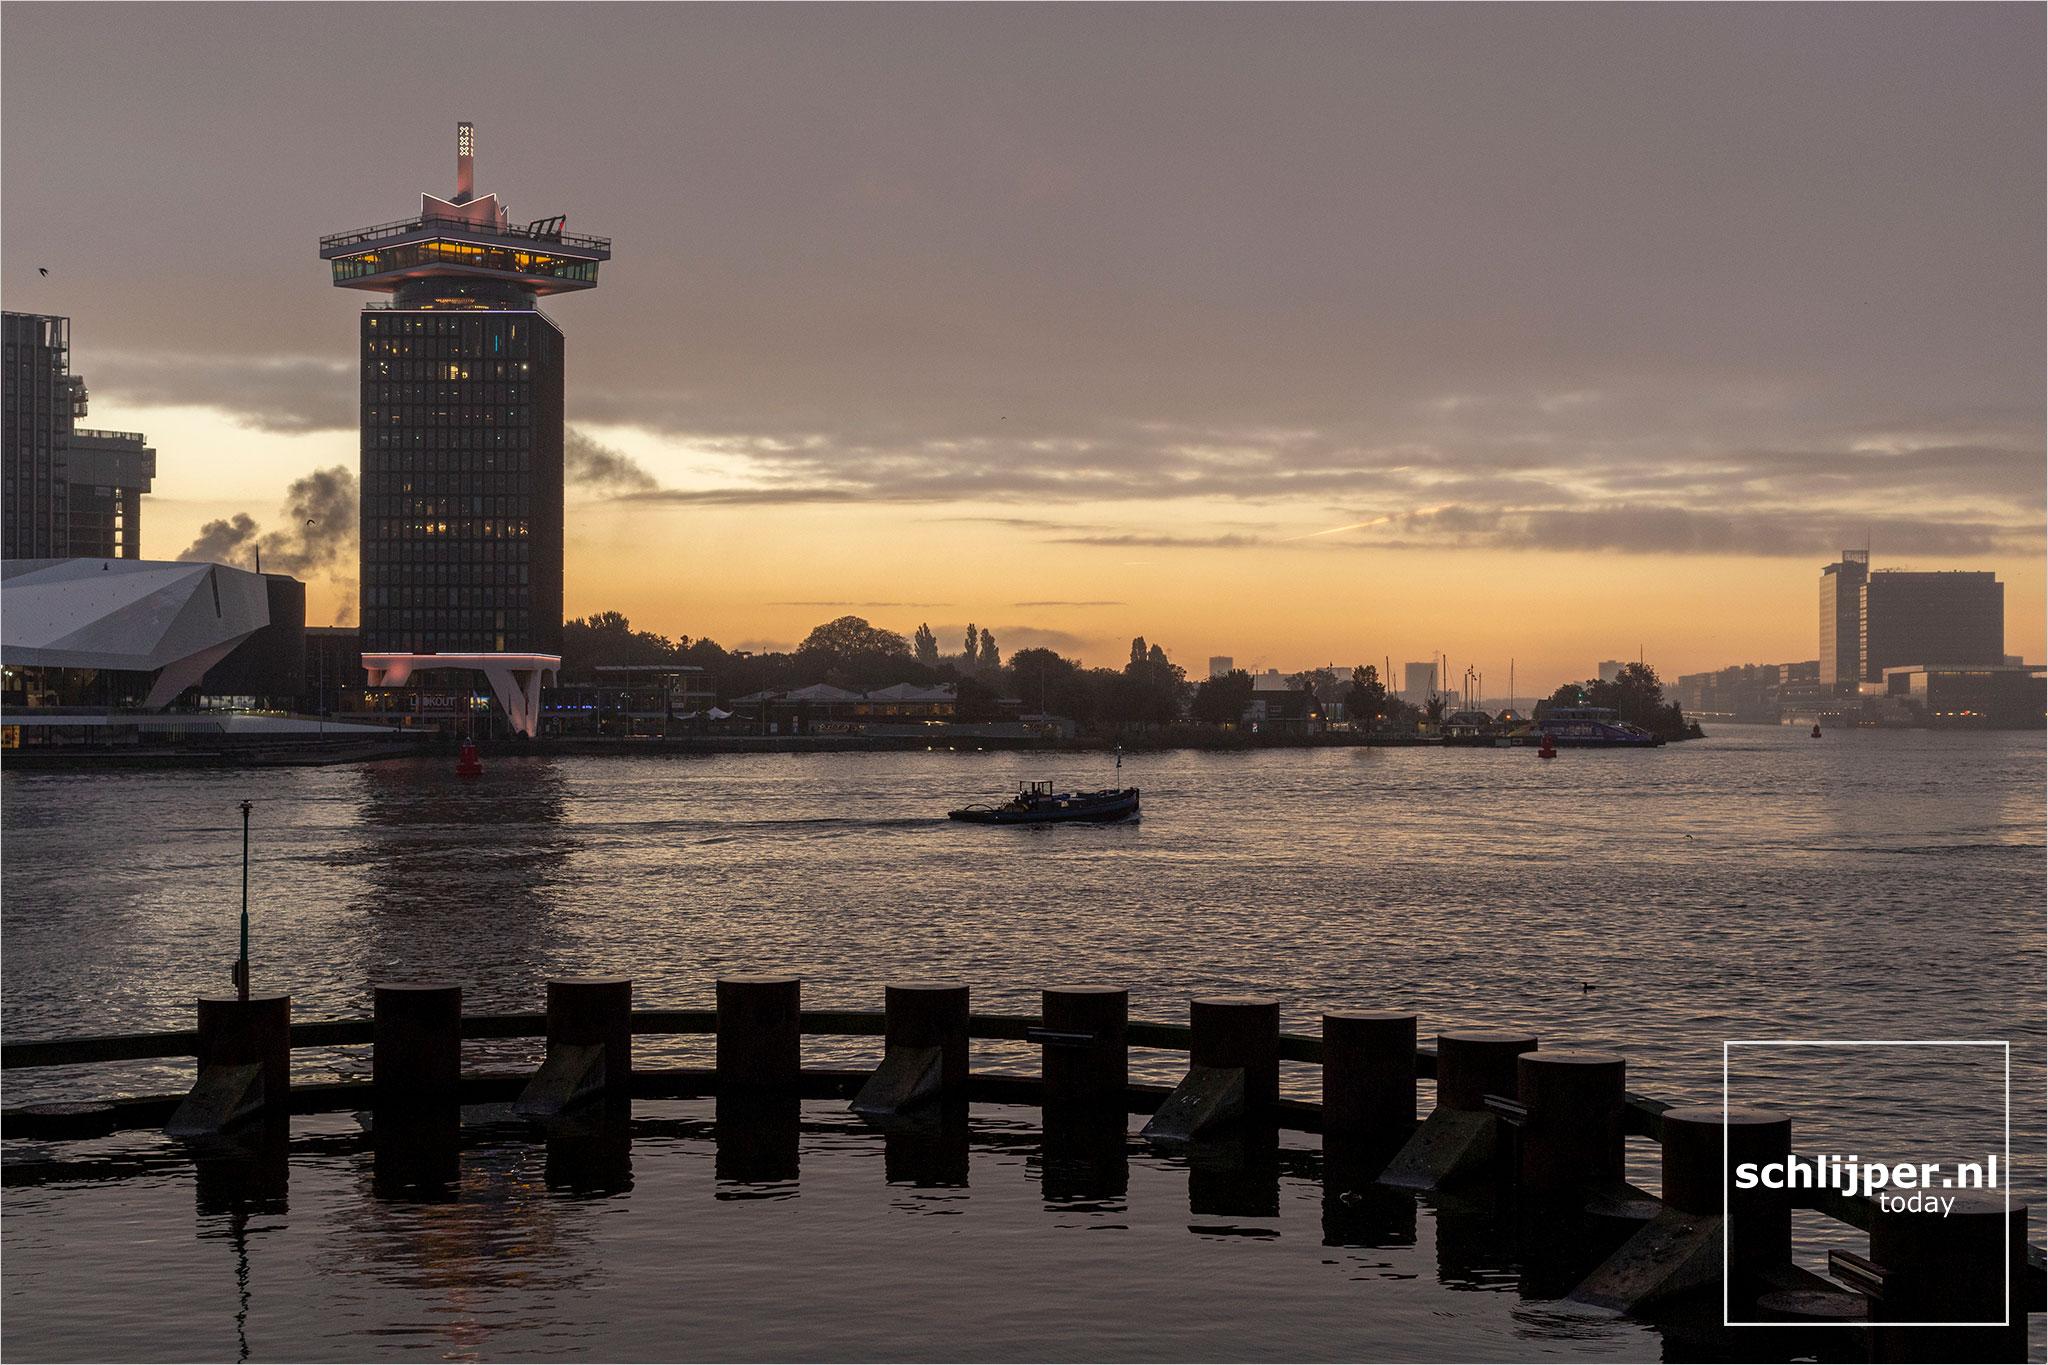 The Netherlands, Amsterdam, 7 oktober 2021